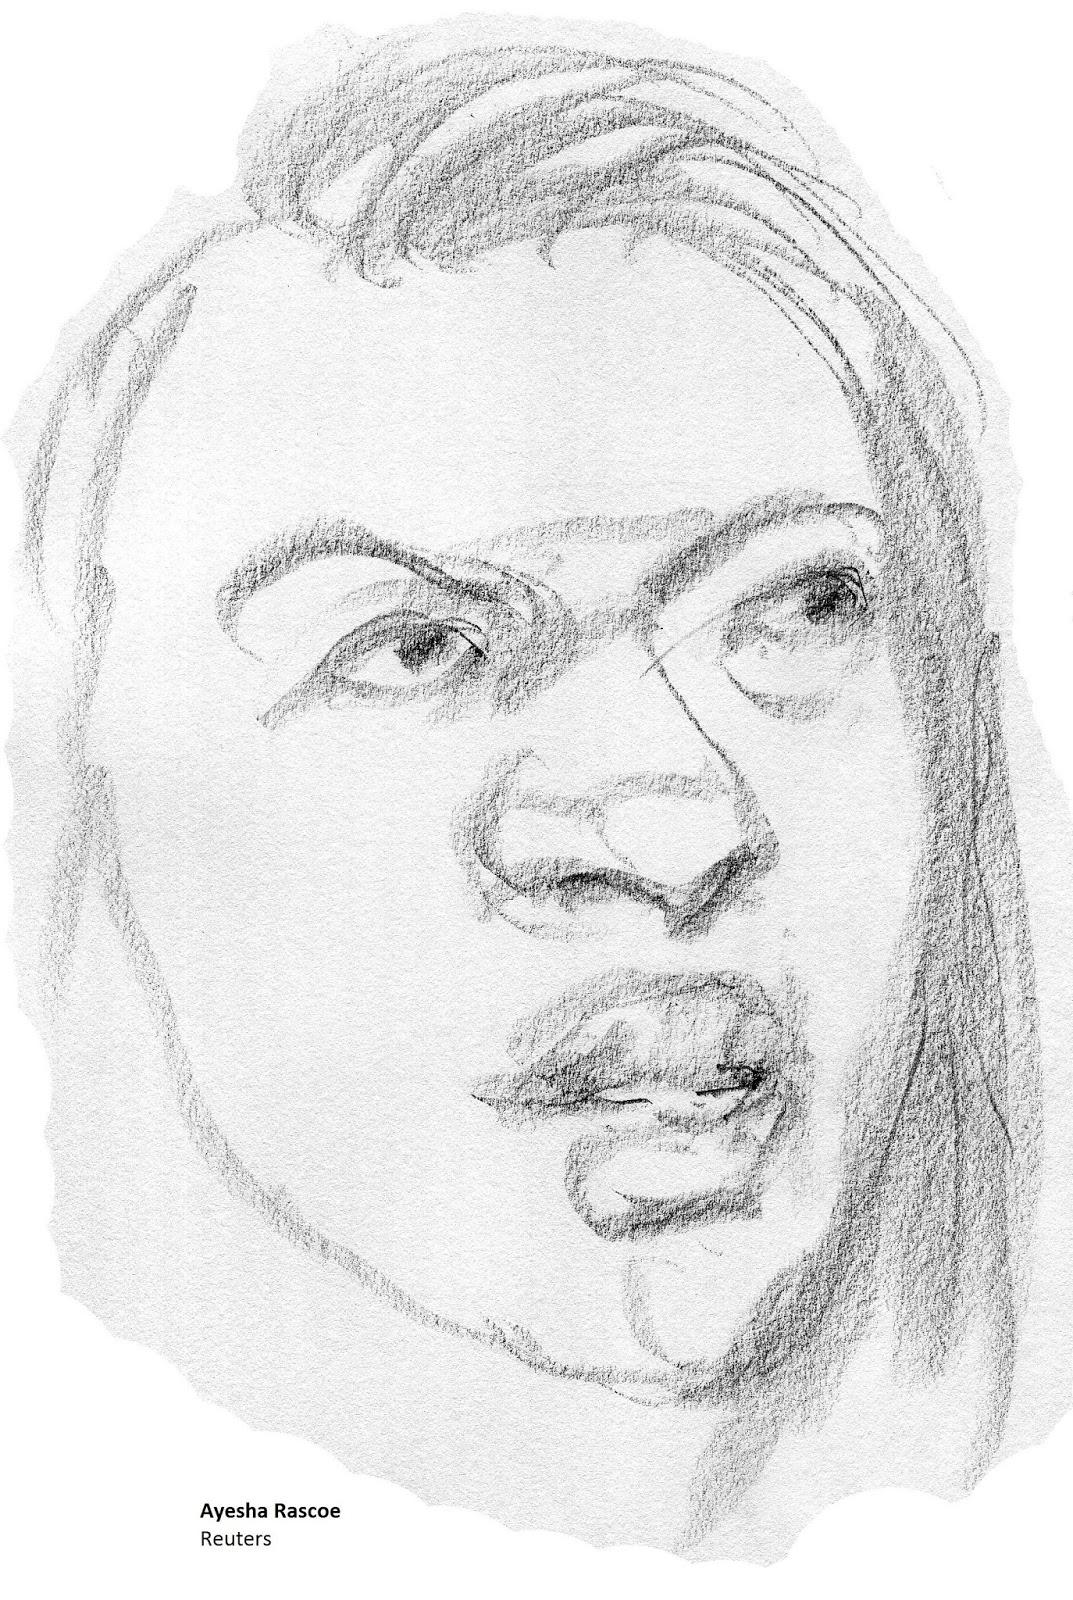 daily drawings: Ayesha Rascoe